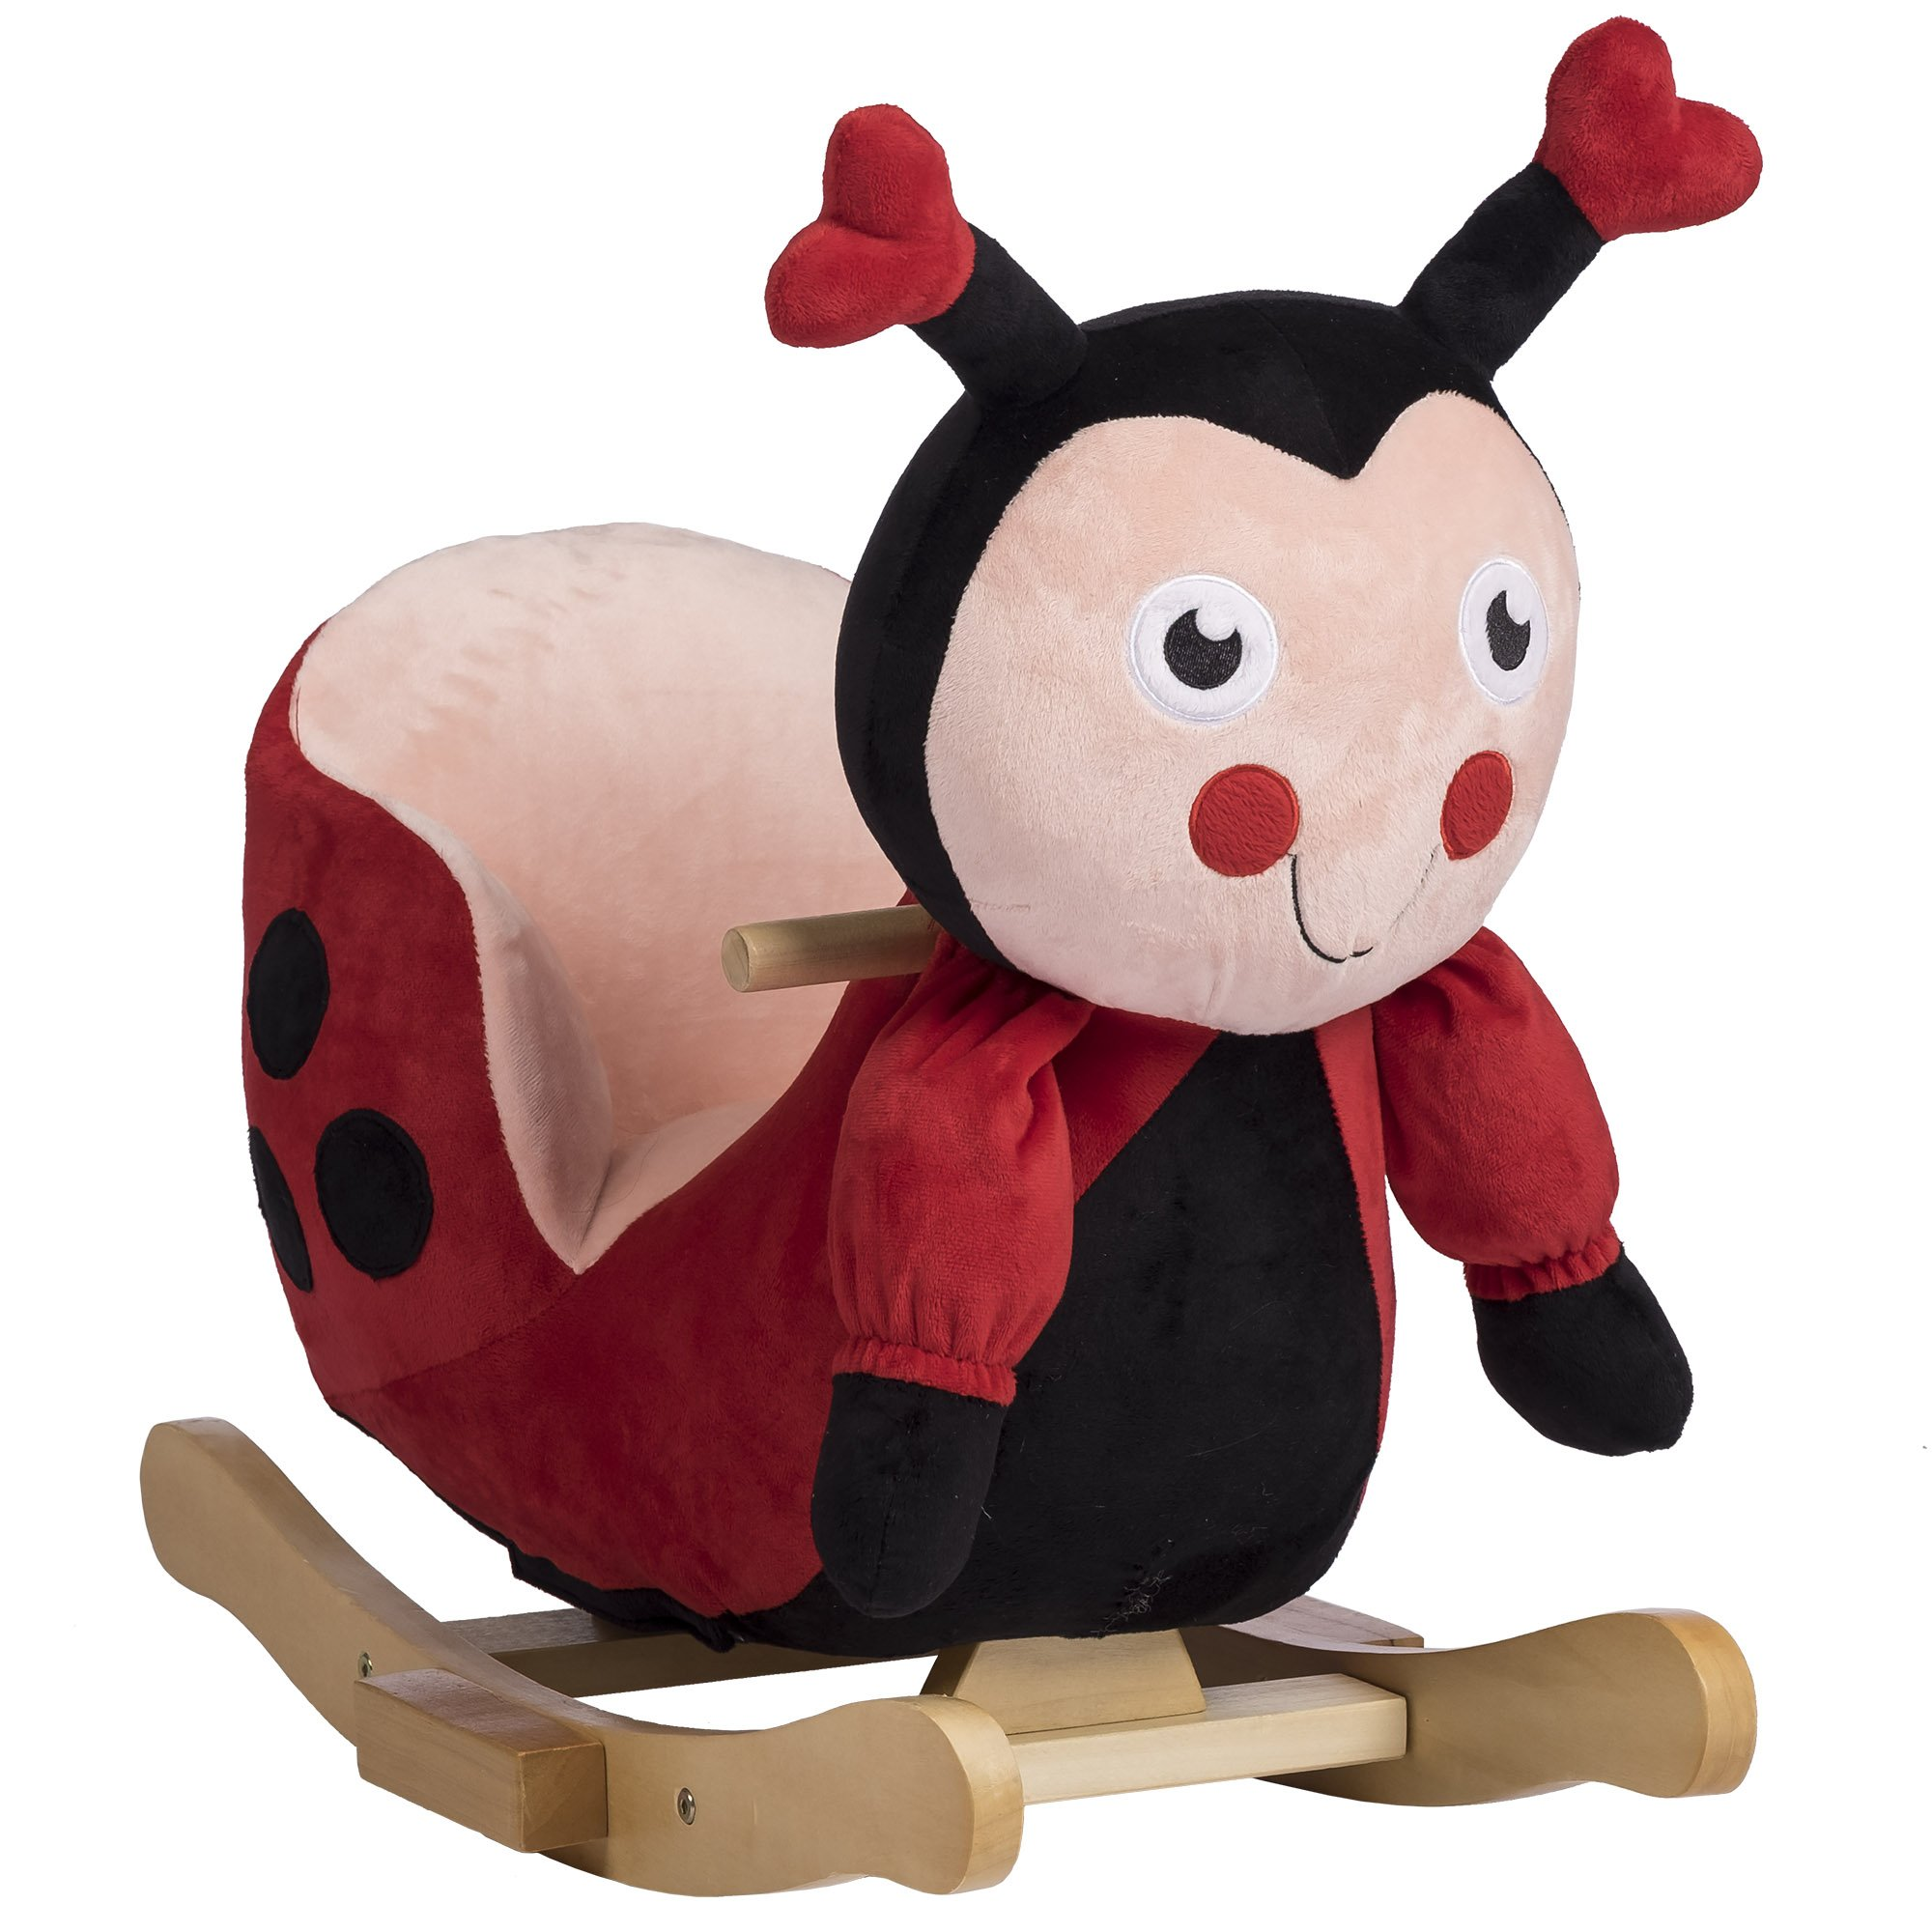 Rockin' Rider Lala The Ladybug Baby Rocker Plush Ride-On, Red by Rockin' Rider (Image #1)